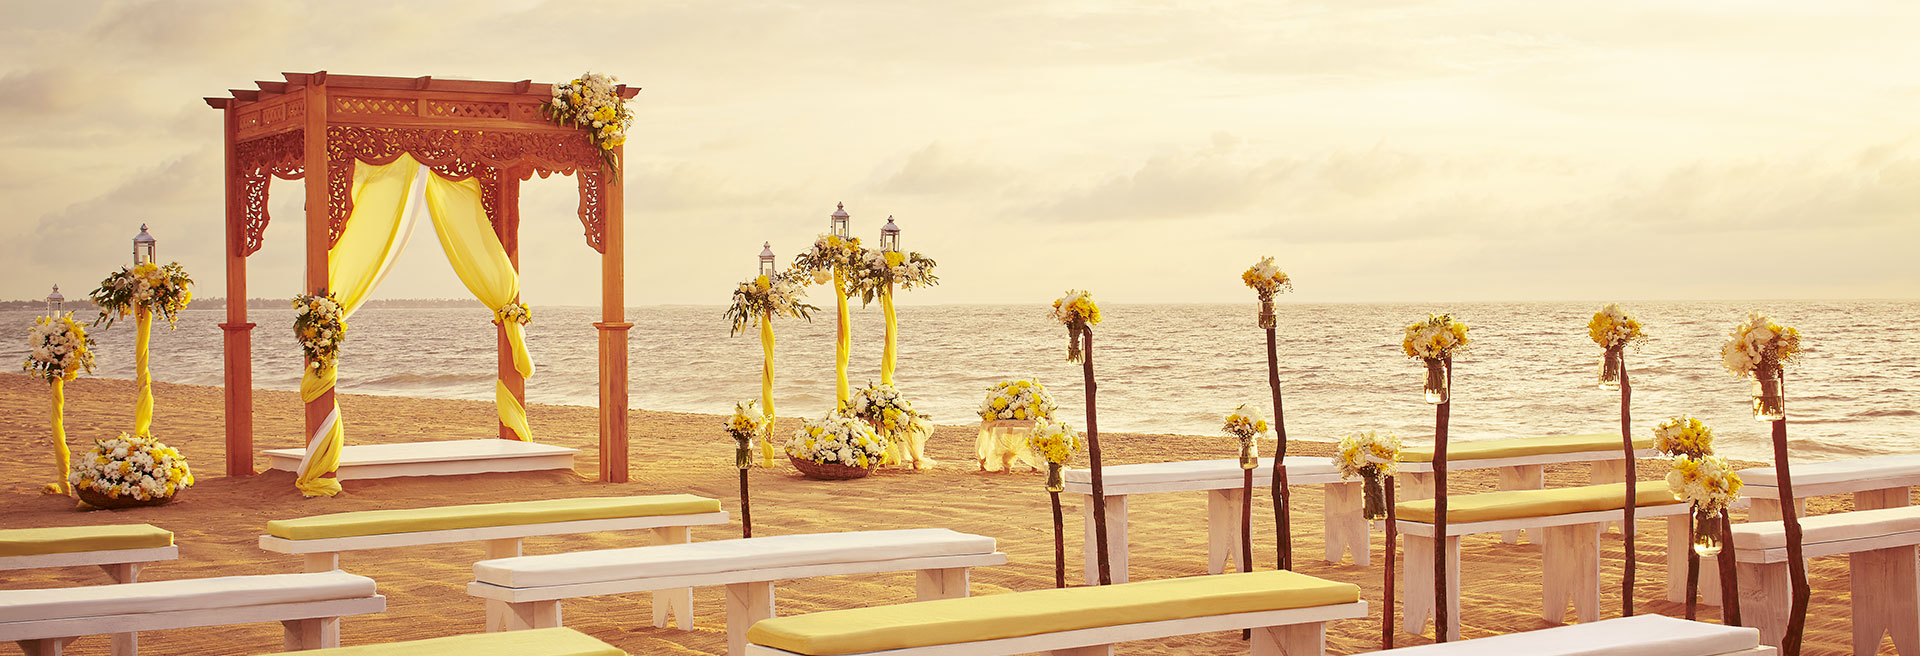 Beach wedding with a traditional poruwa